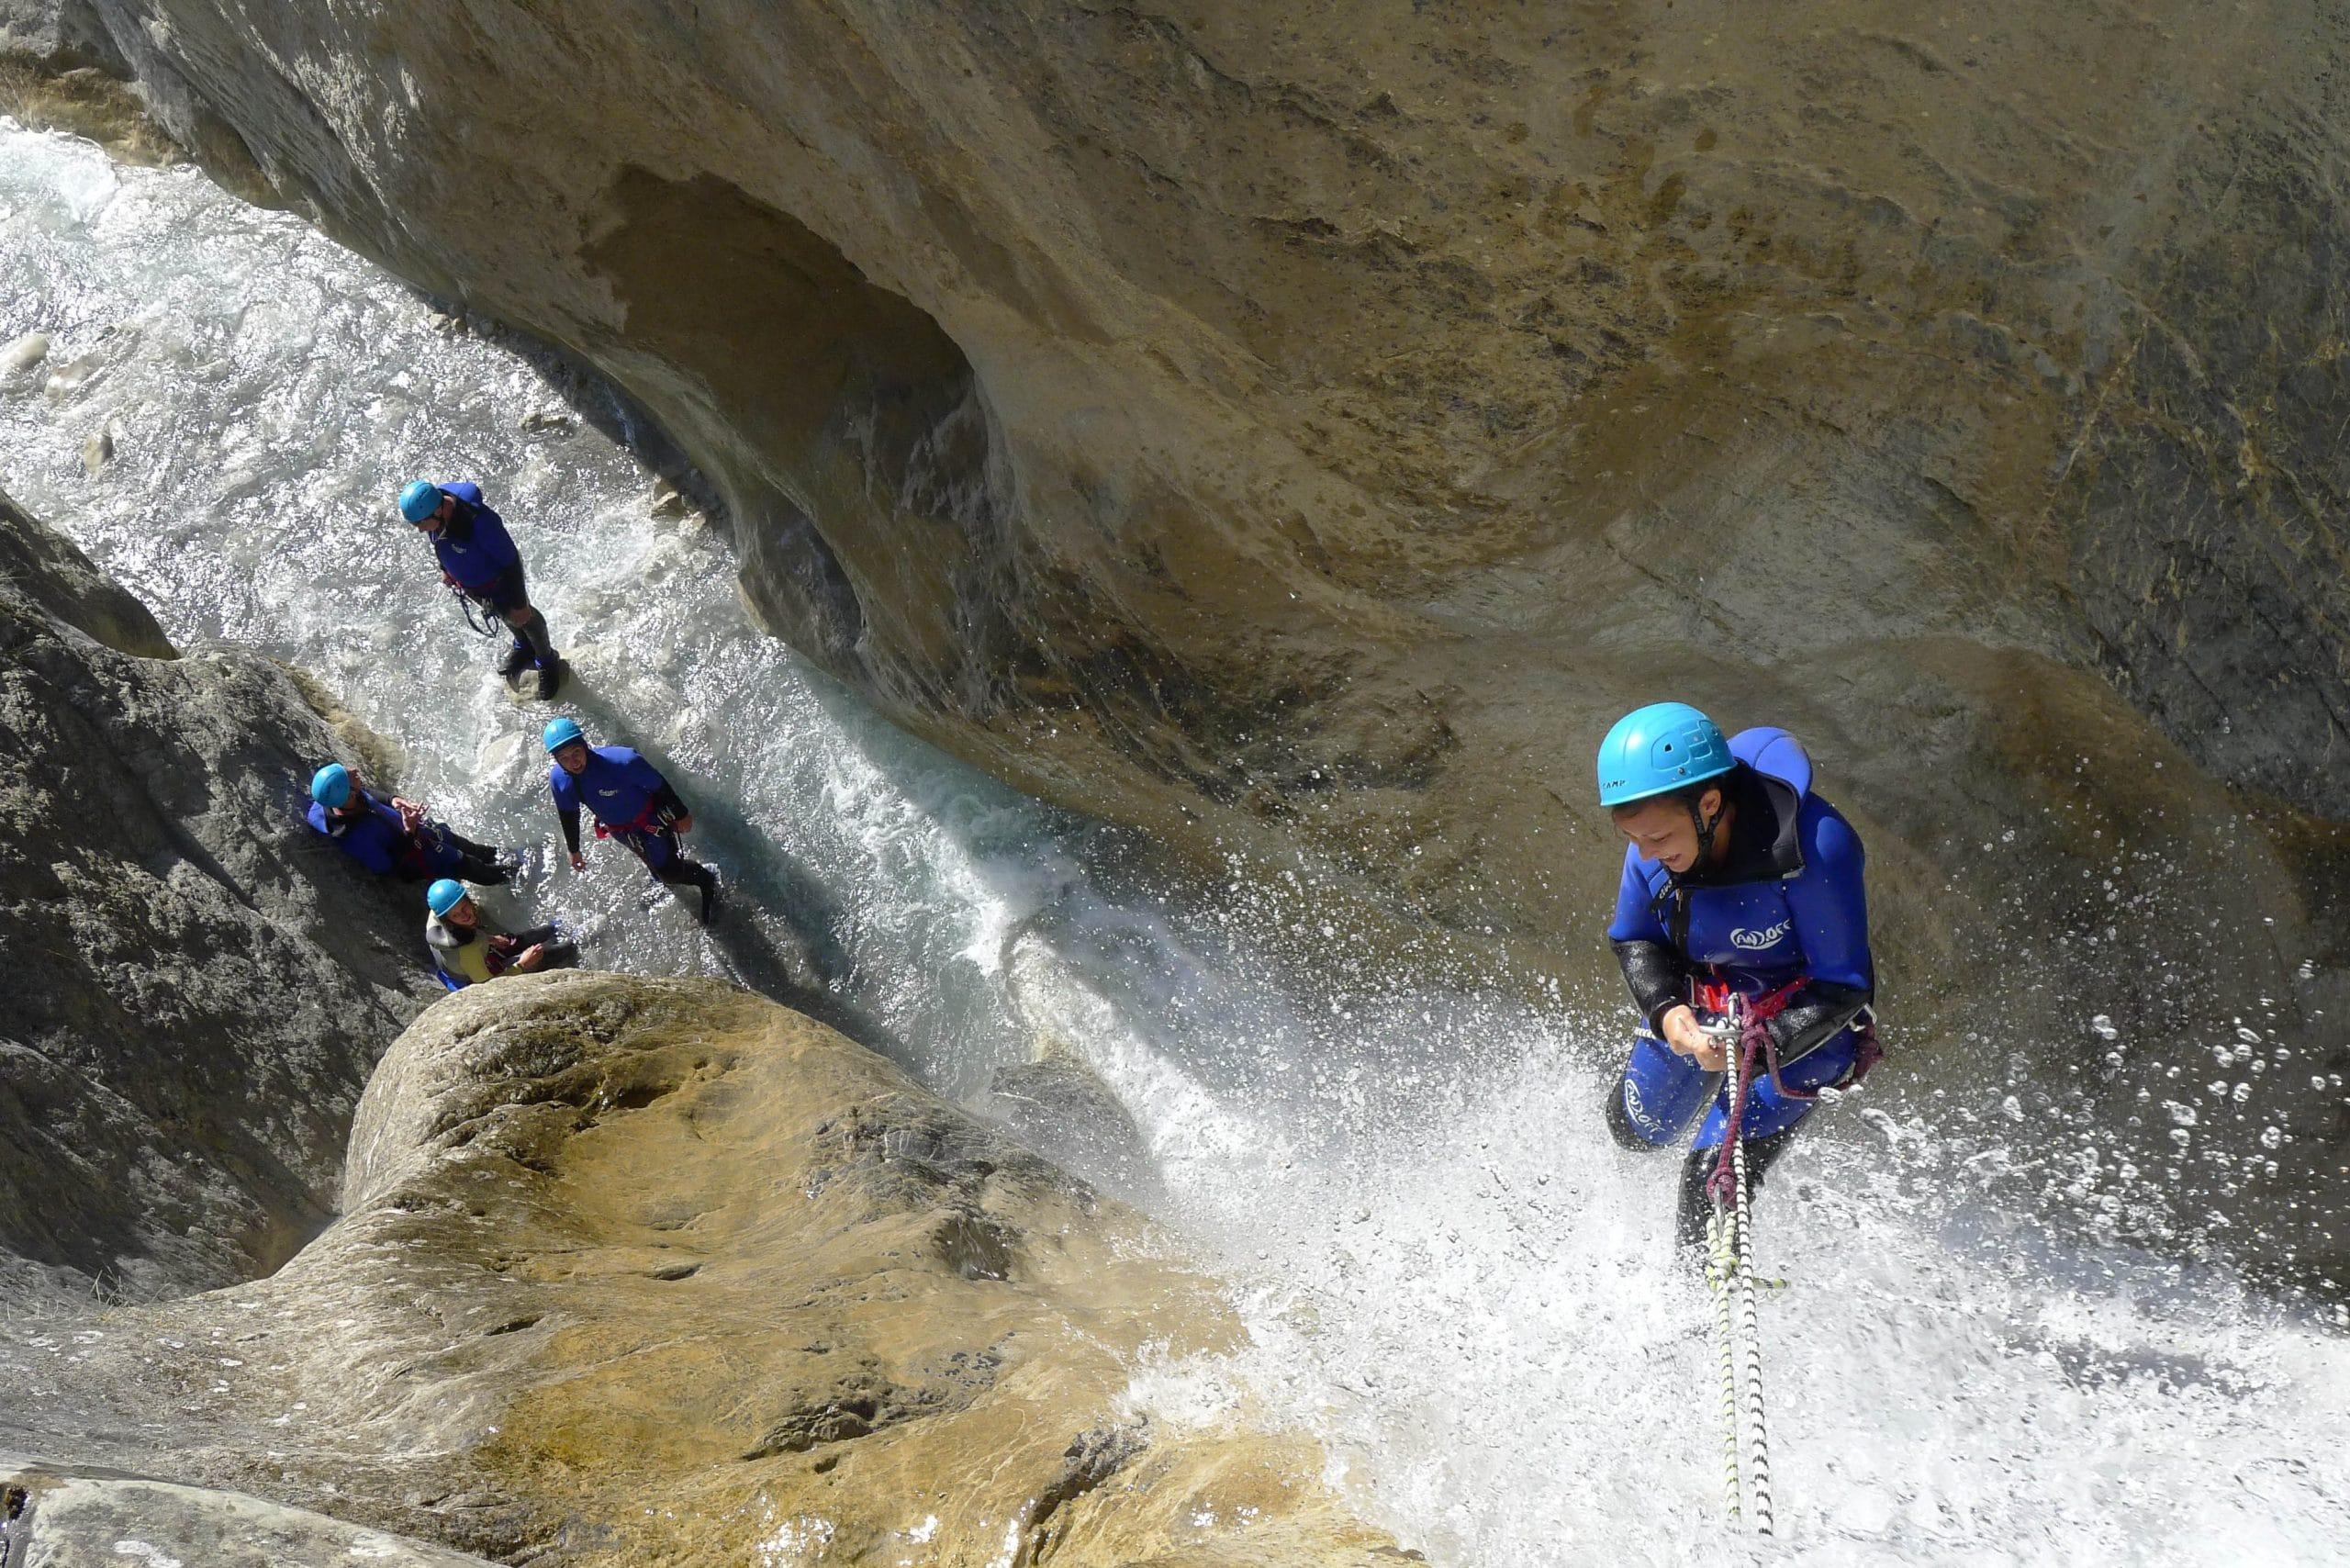 canyoning-millau-12000-descente-de-canyon-millau